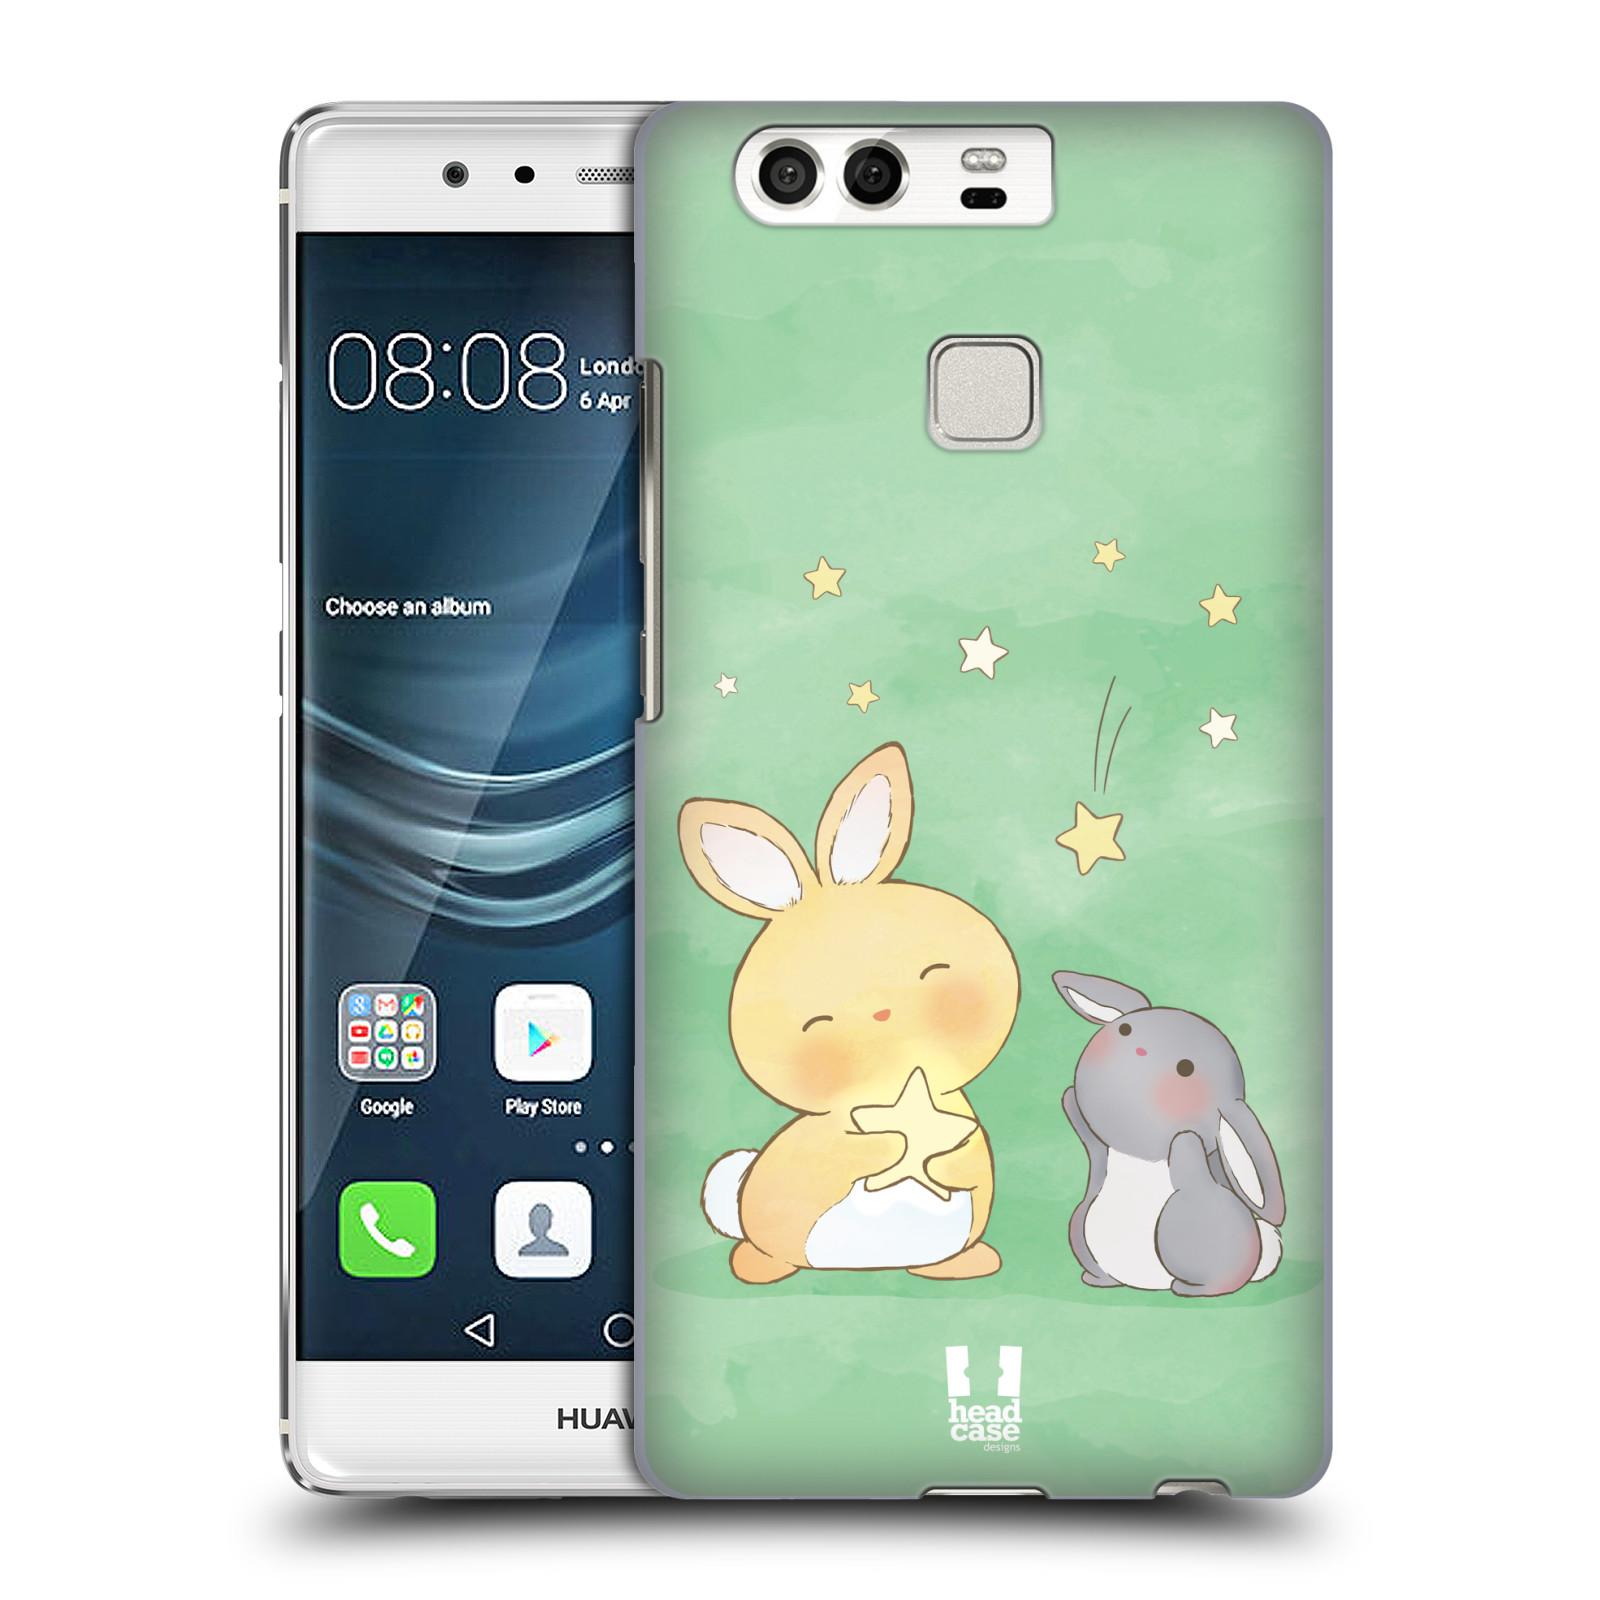 HEAD CASE plastový obal na mobil Huawei P9 / P9 DUAL SIM vzor králíček a hvězdy zelená